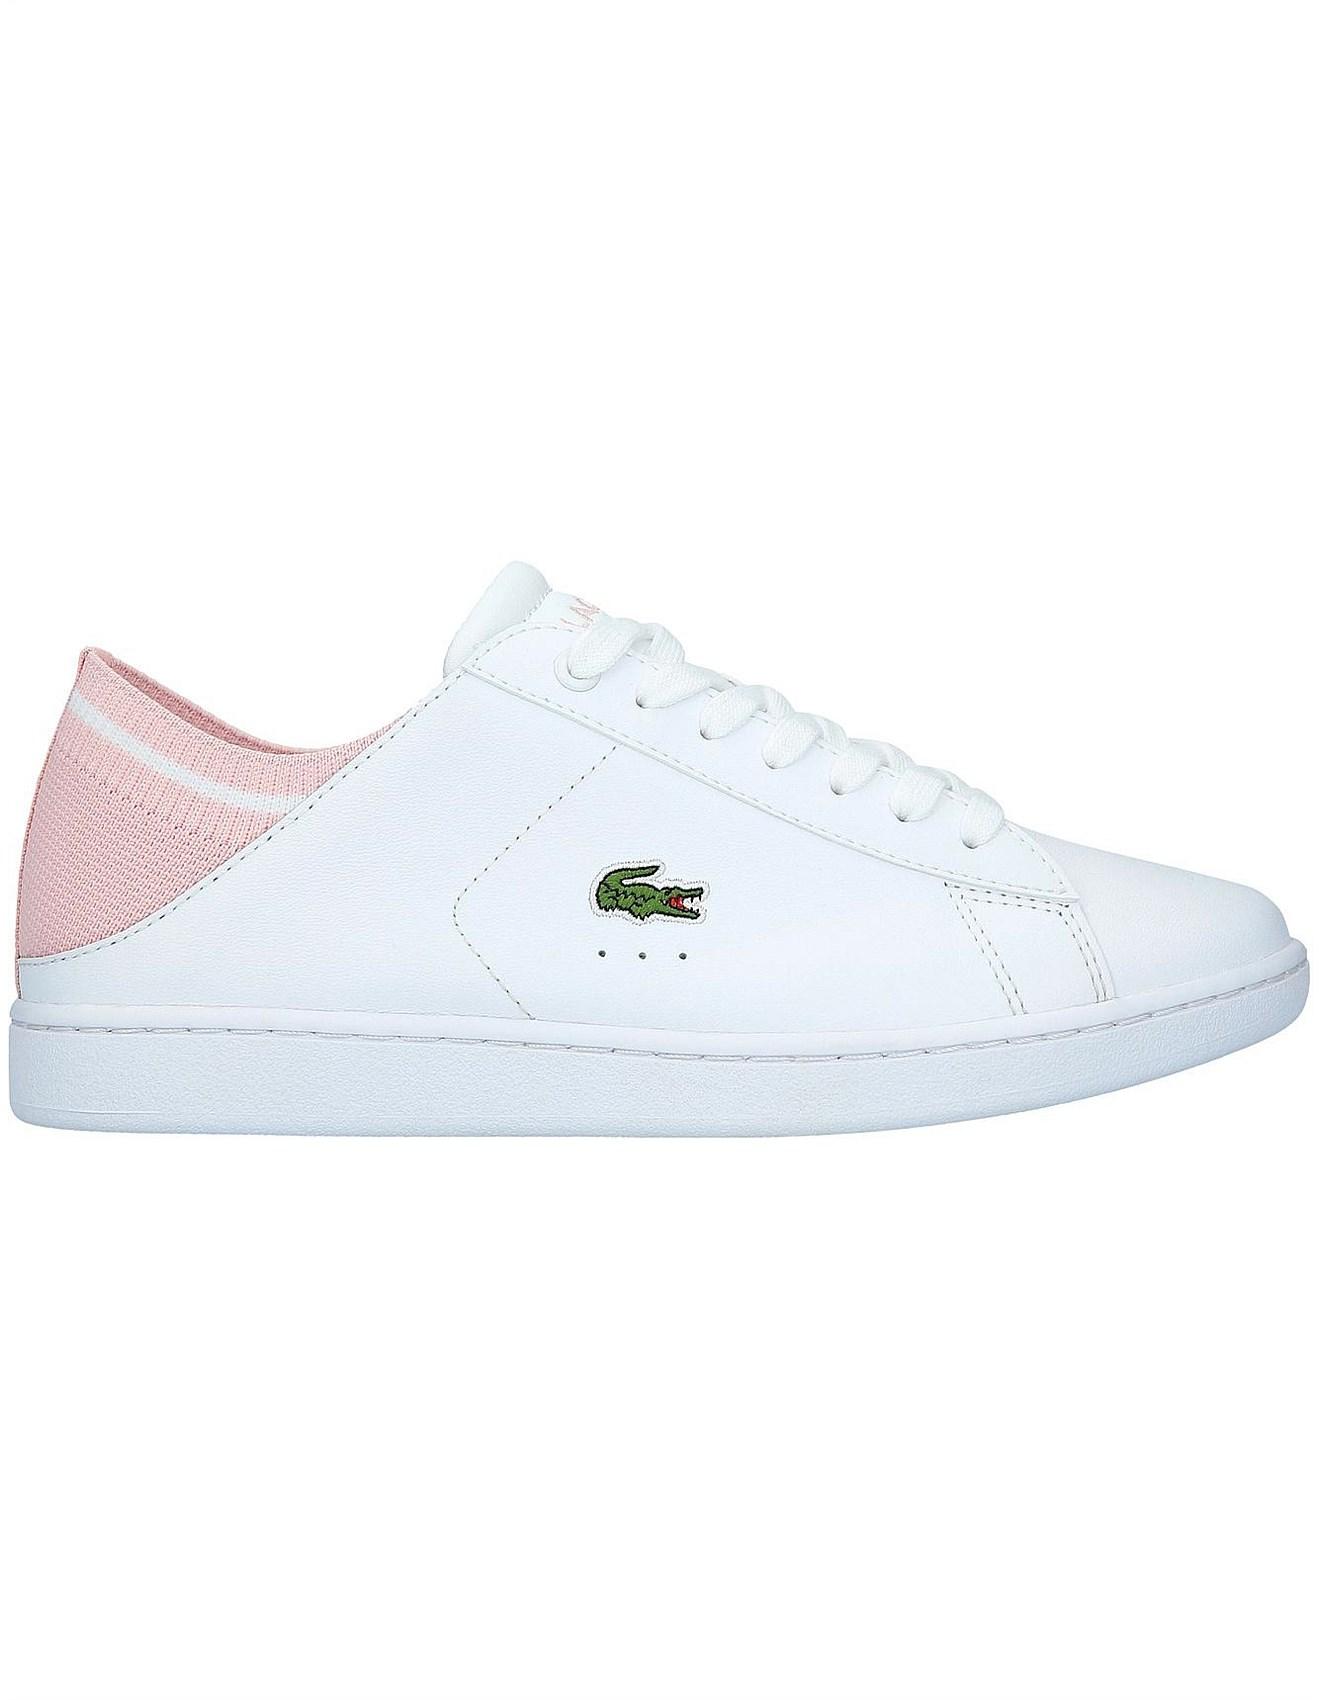 75ab2b037 Carnaby Evo Duo Sneaker